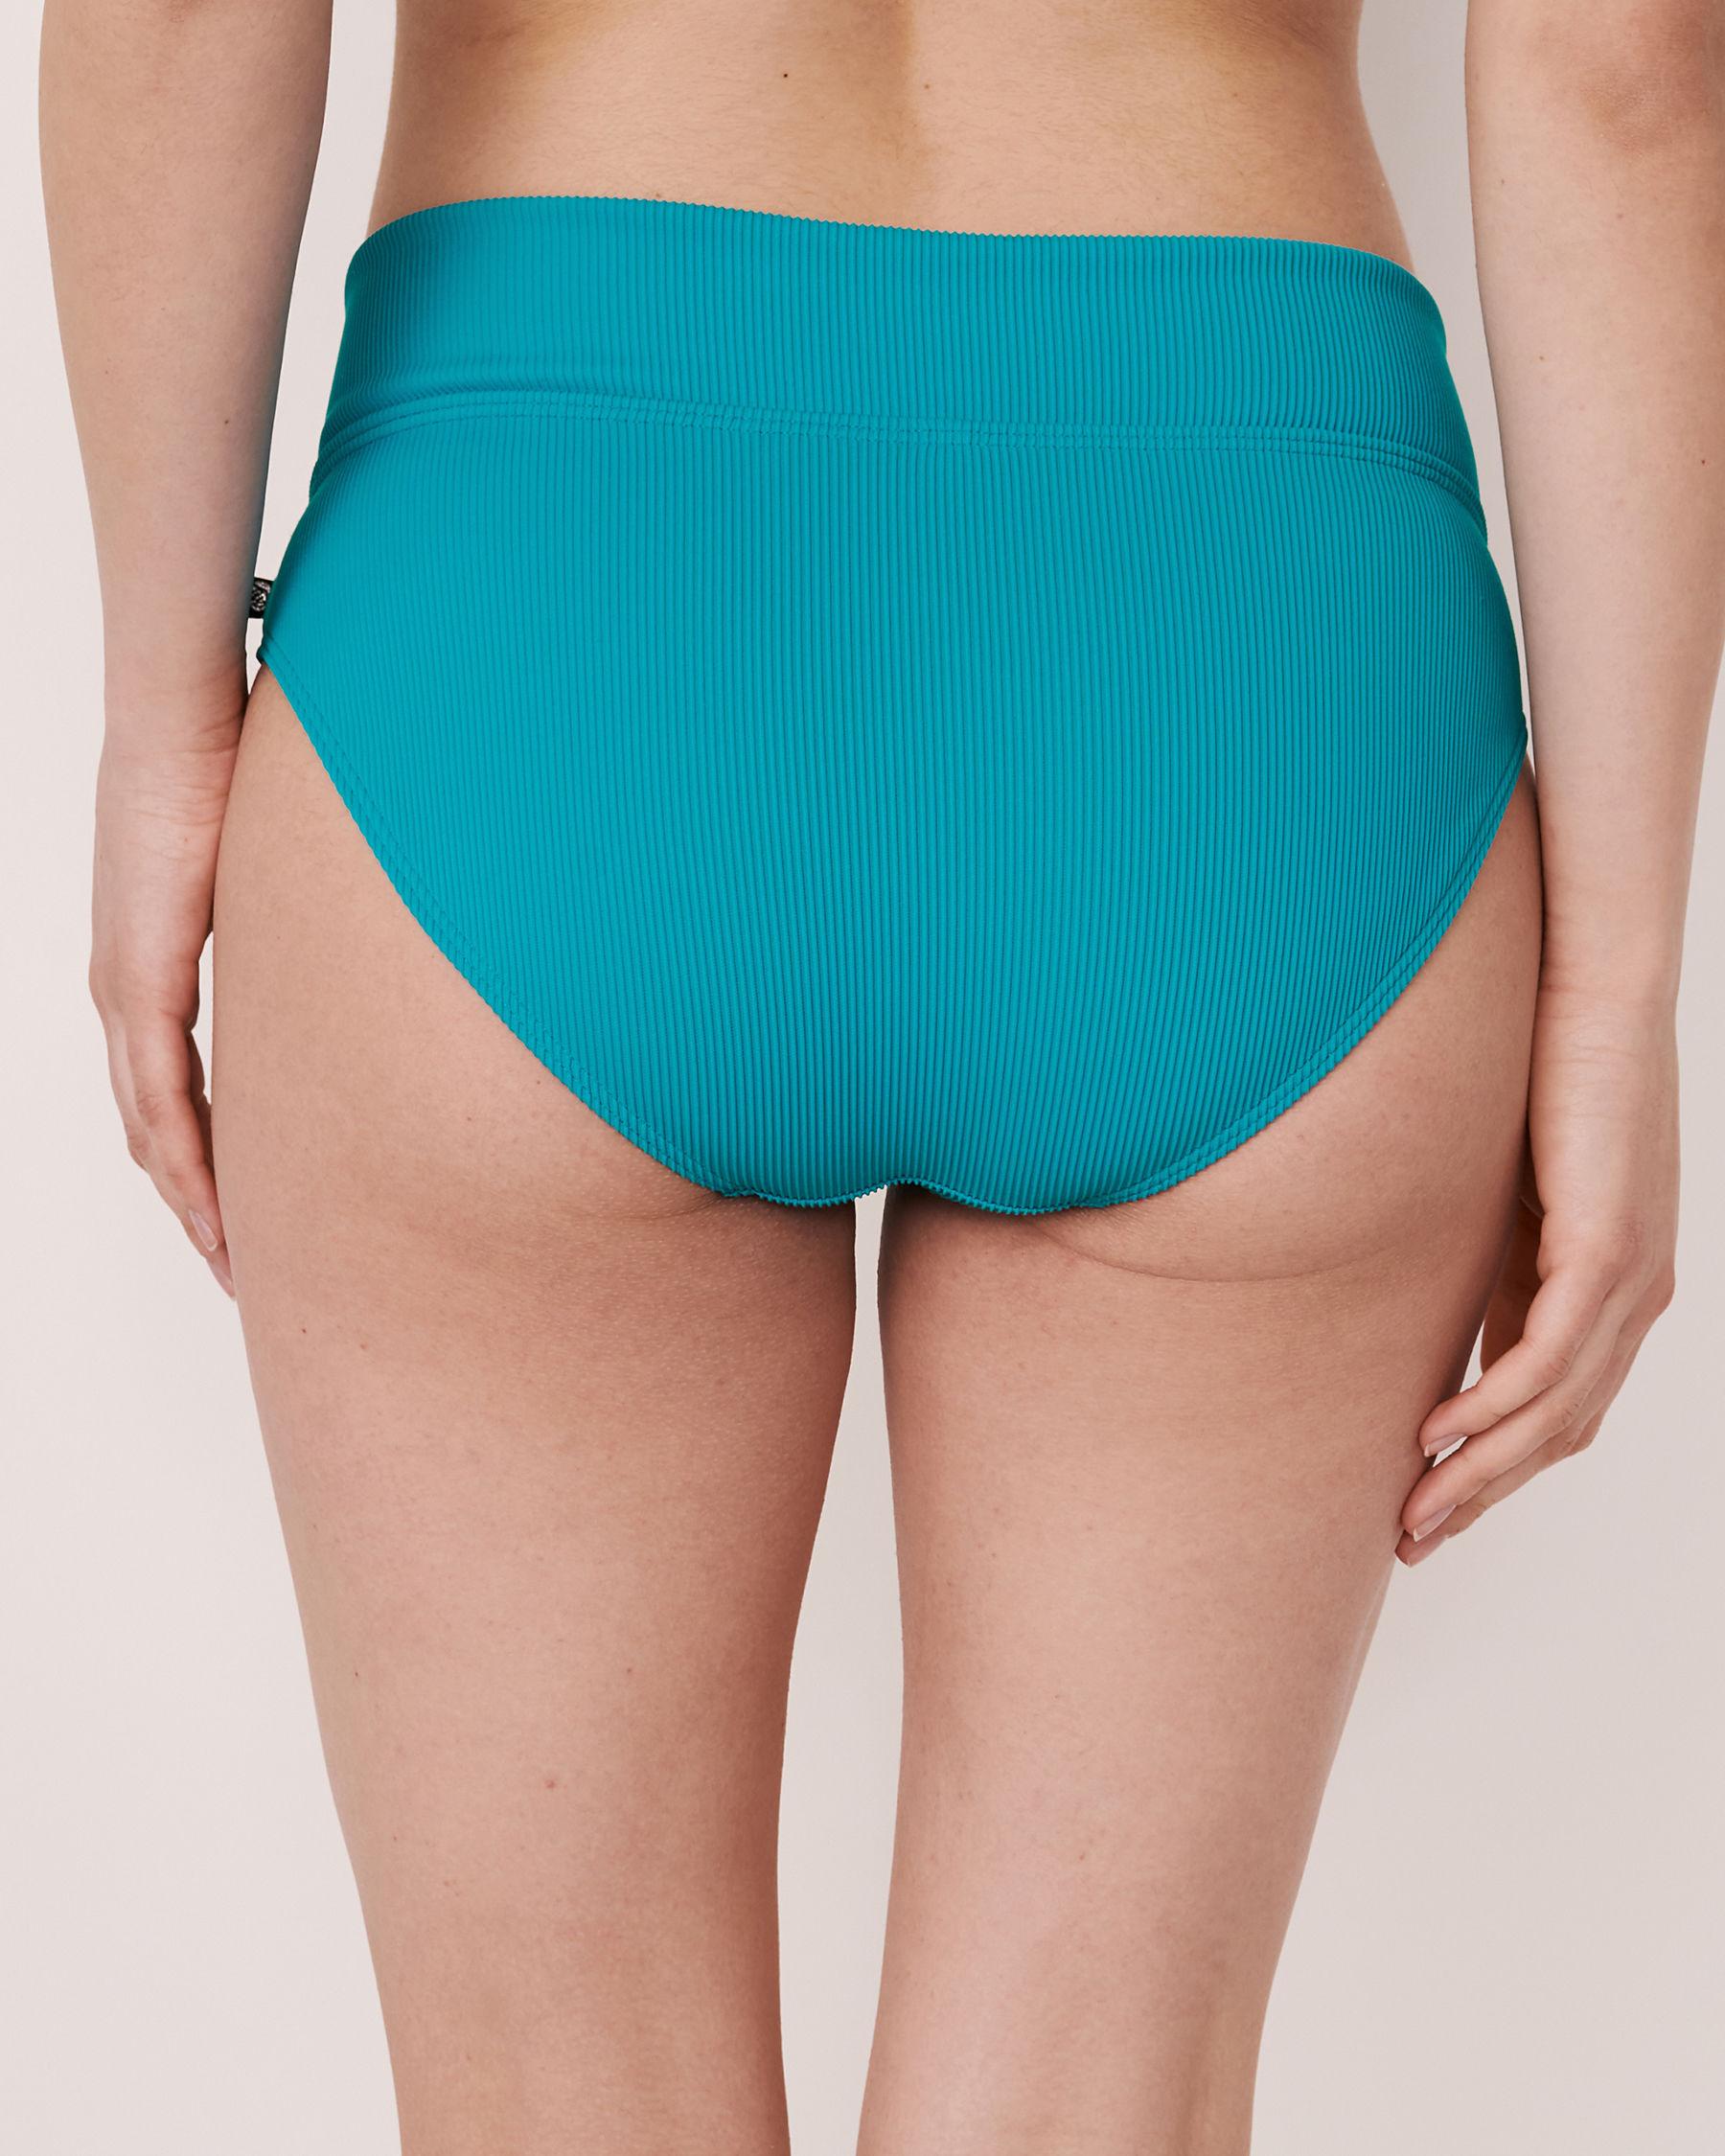 LA VIE EN ROSE AQUA Bas de bikini bande de taille pliable en fibres recyclées TOOTSIE RIB Bleu 70300063 - Voir4